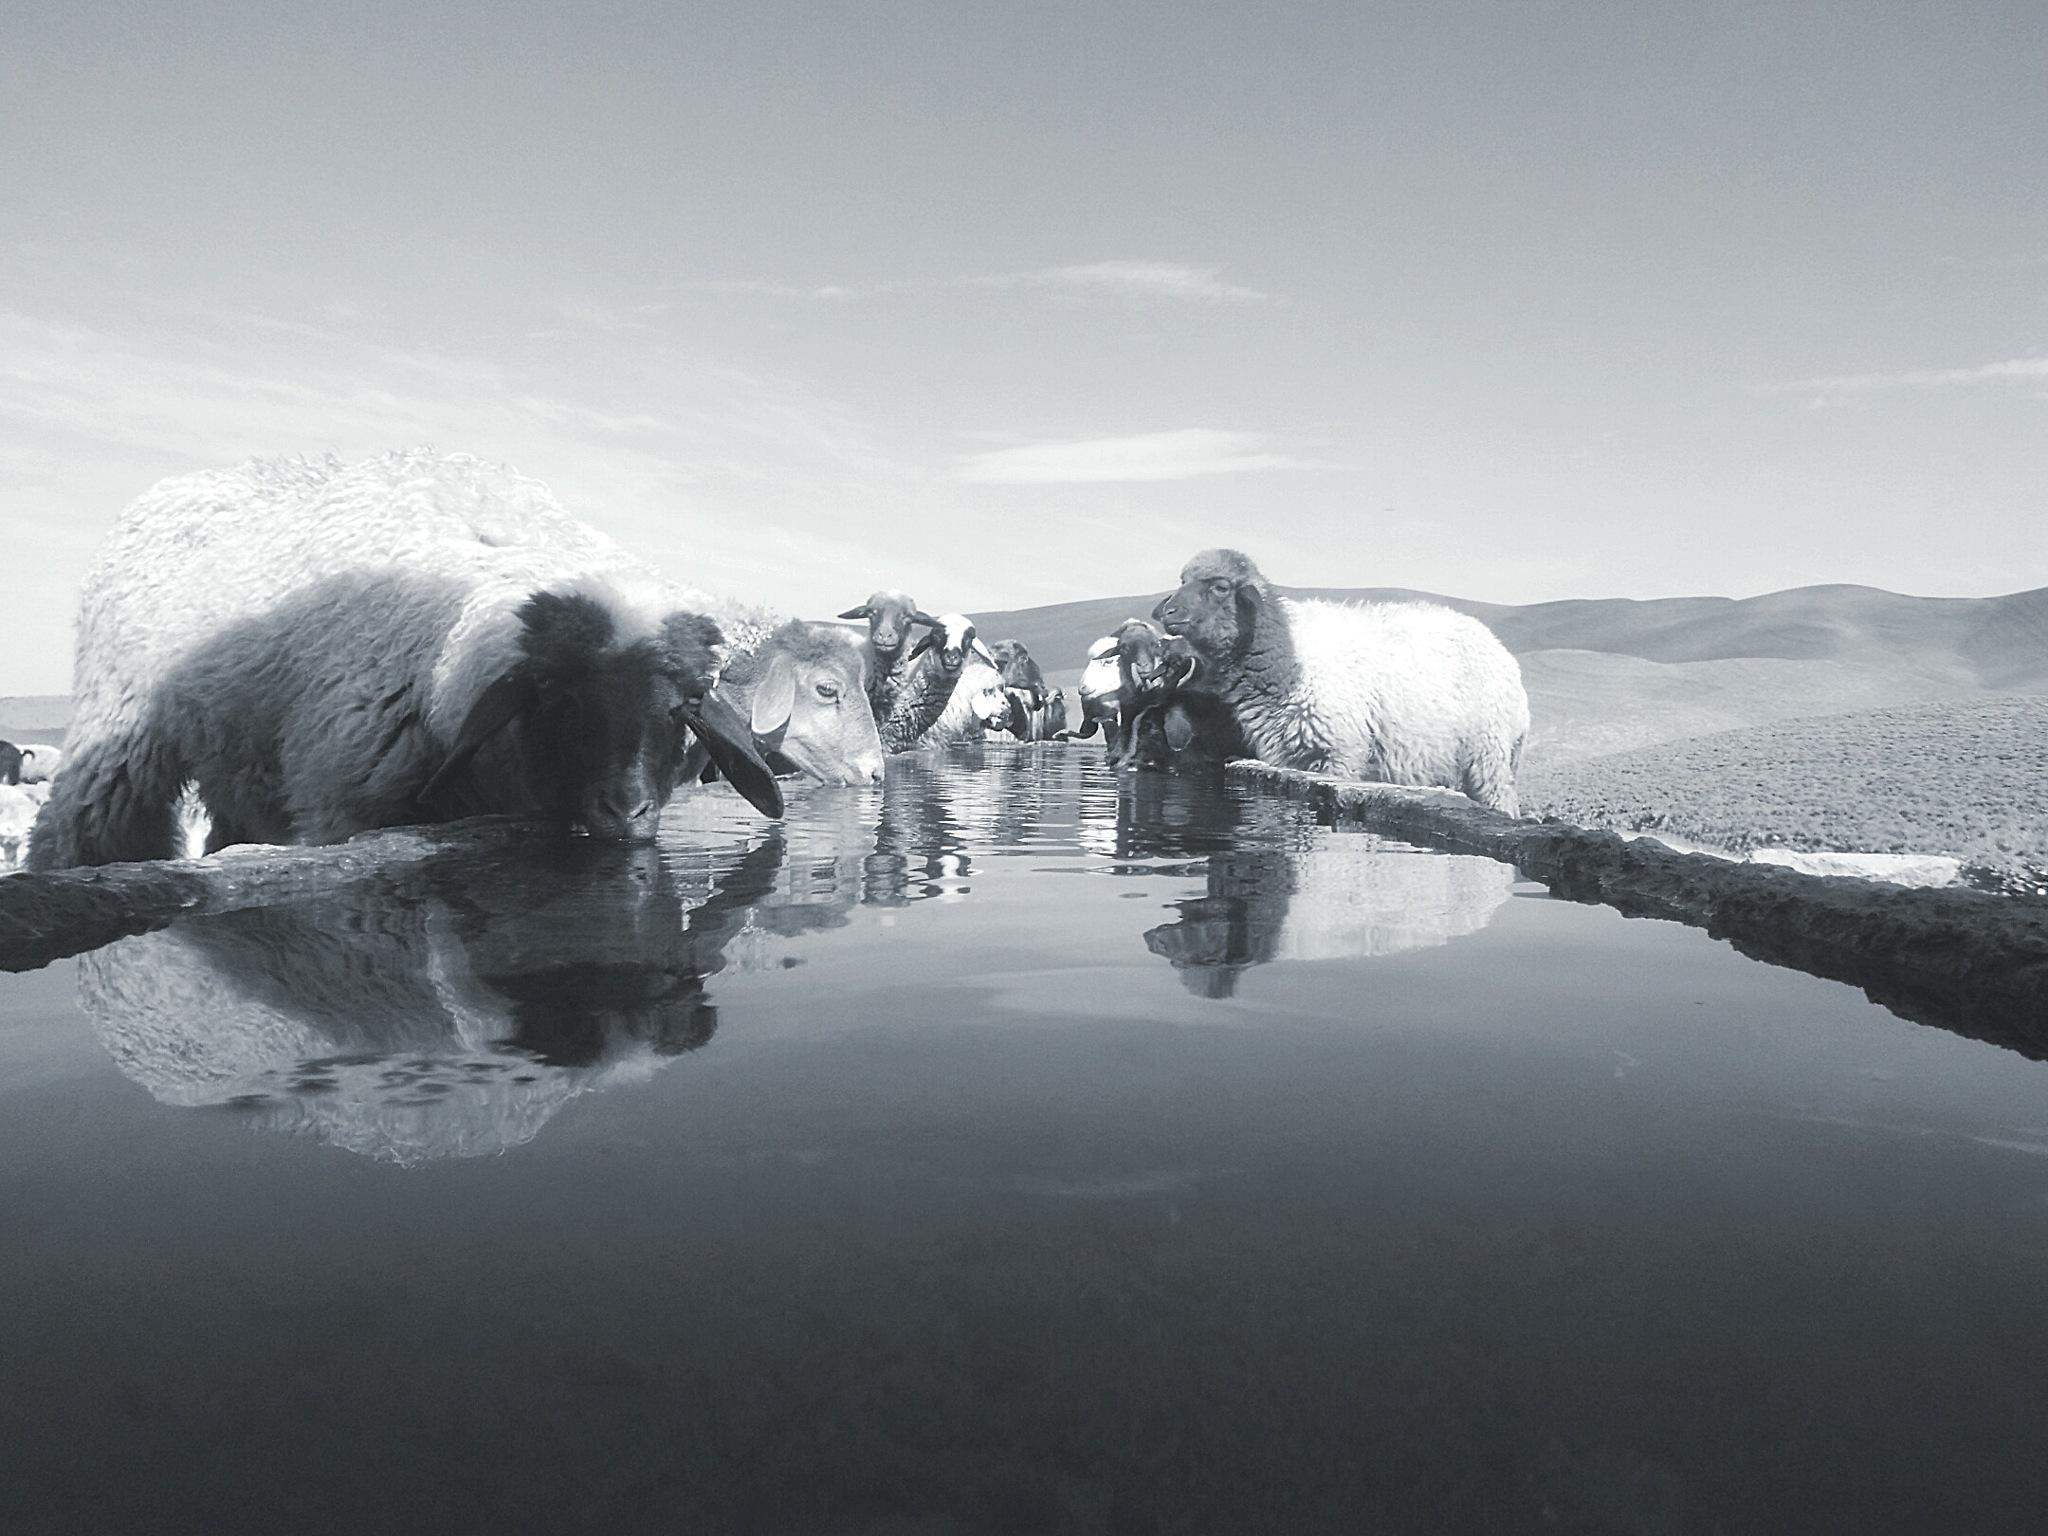 Sheep and stream by REDWANCHITAM